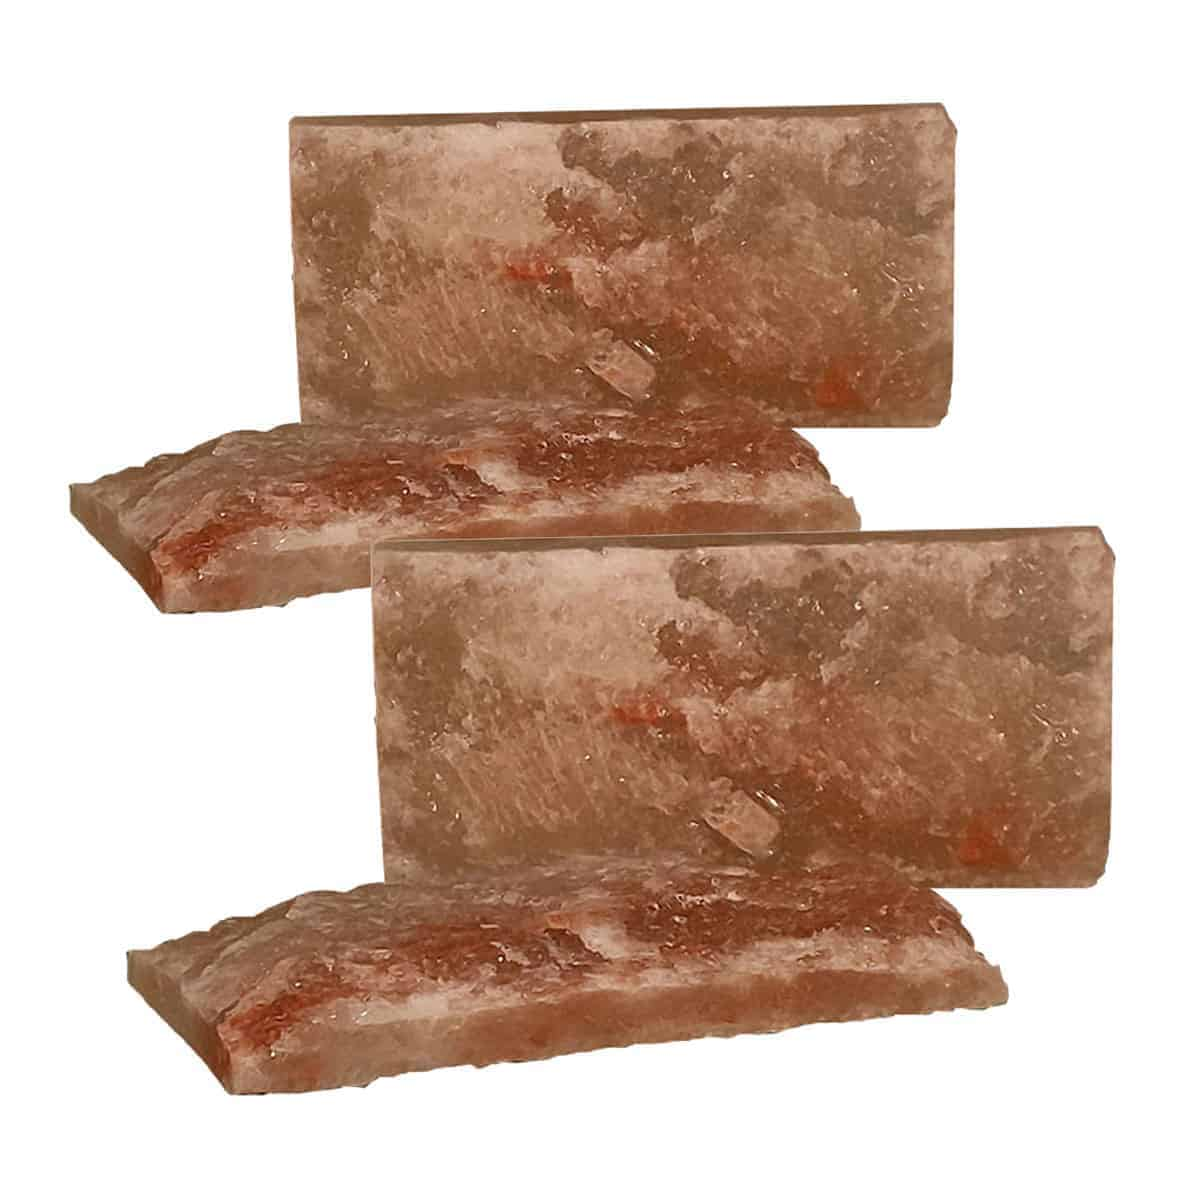 4x8x1 Rough Faced Salt Brick Quantity 4